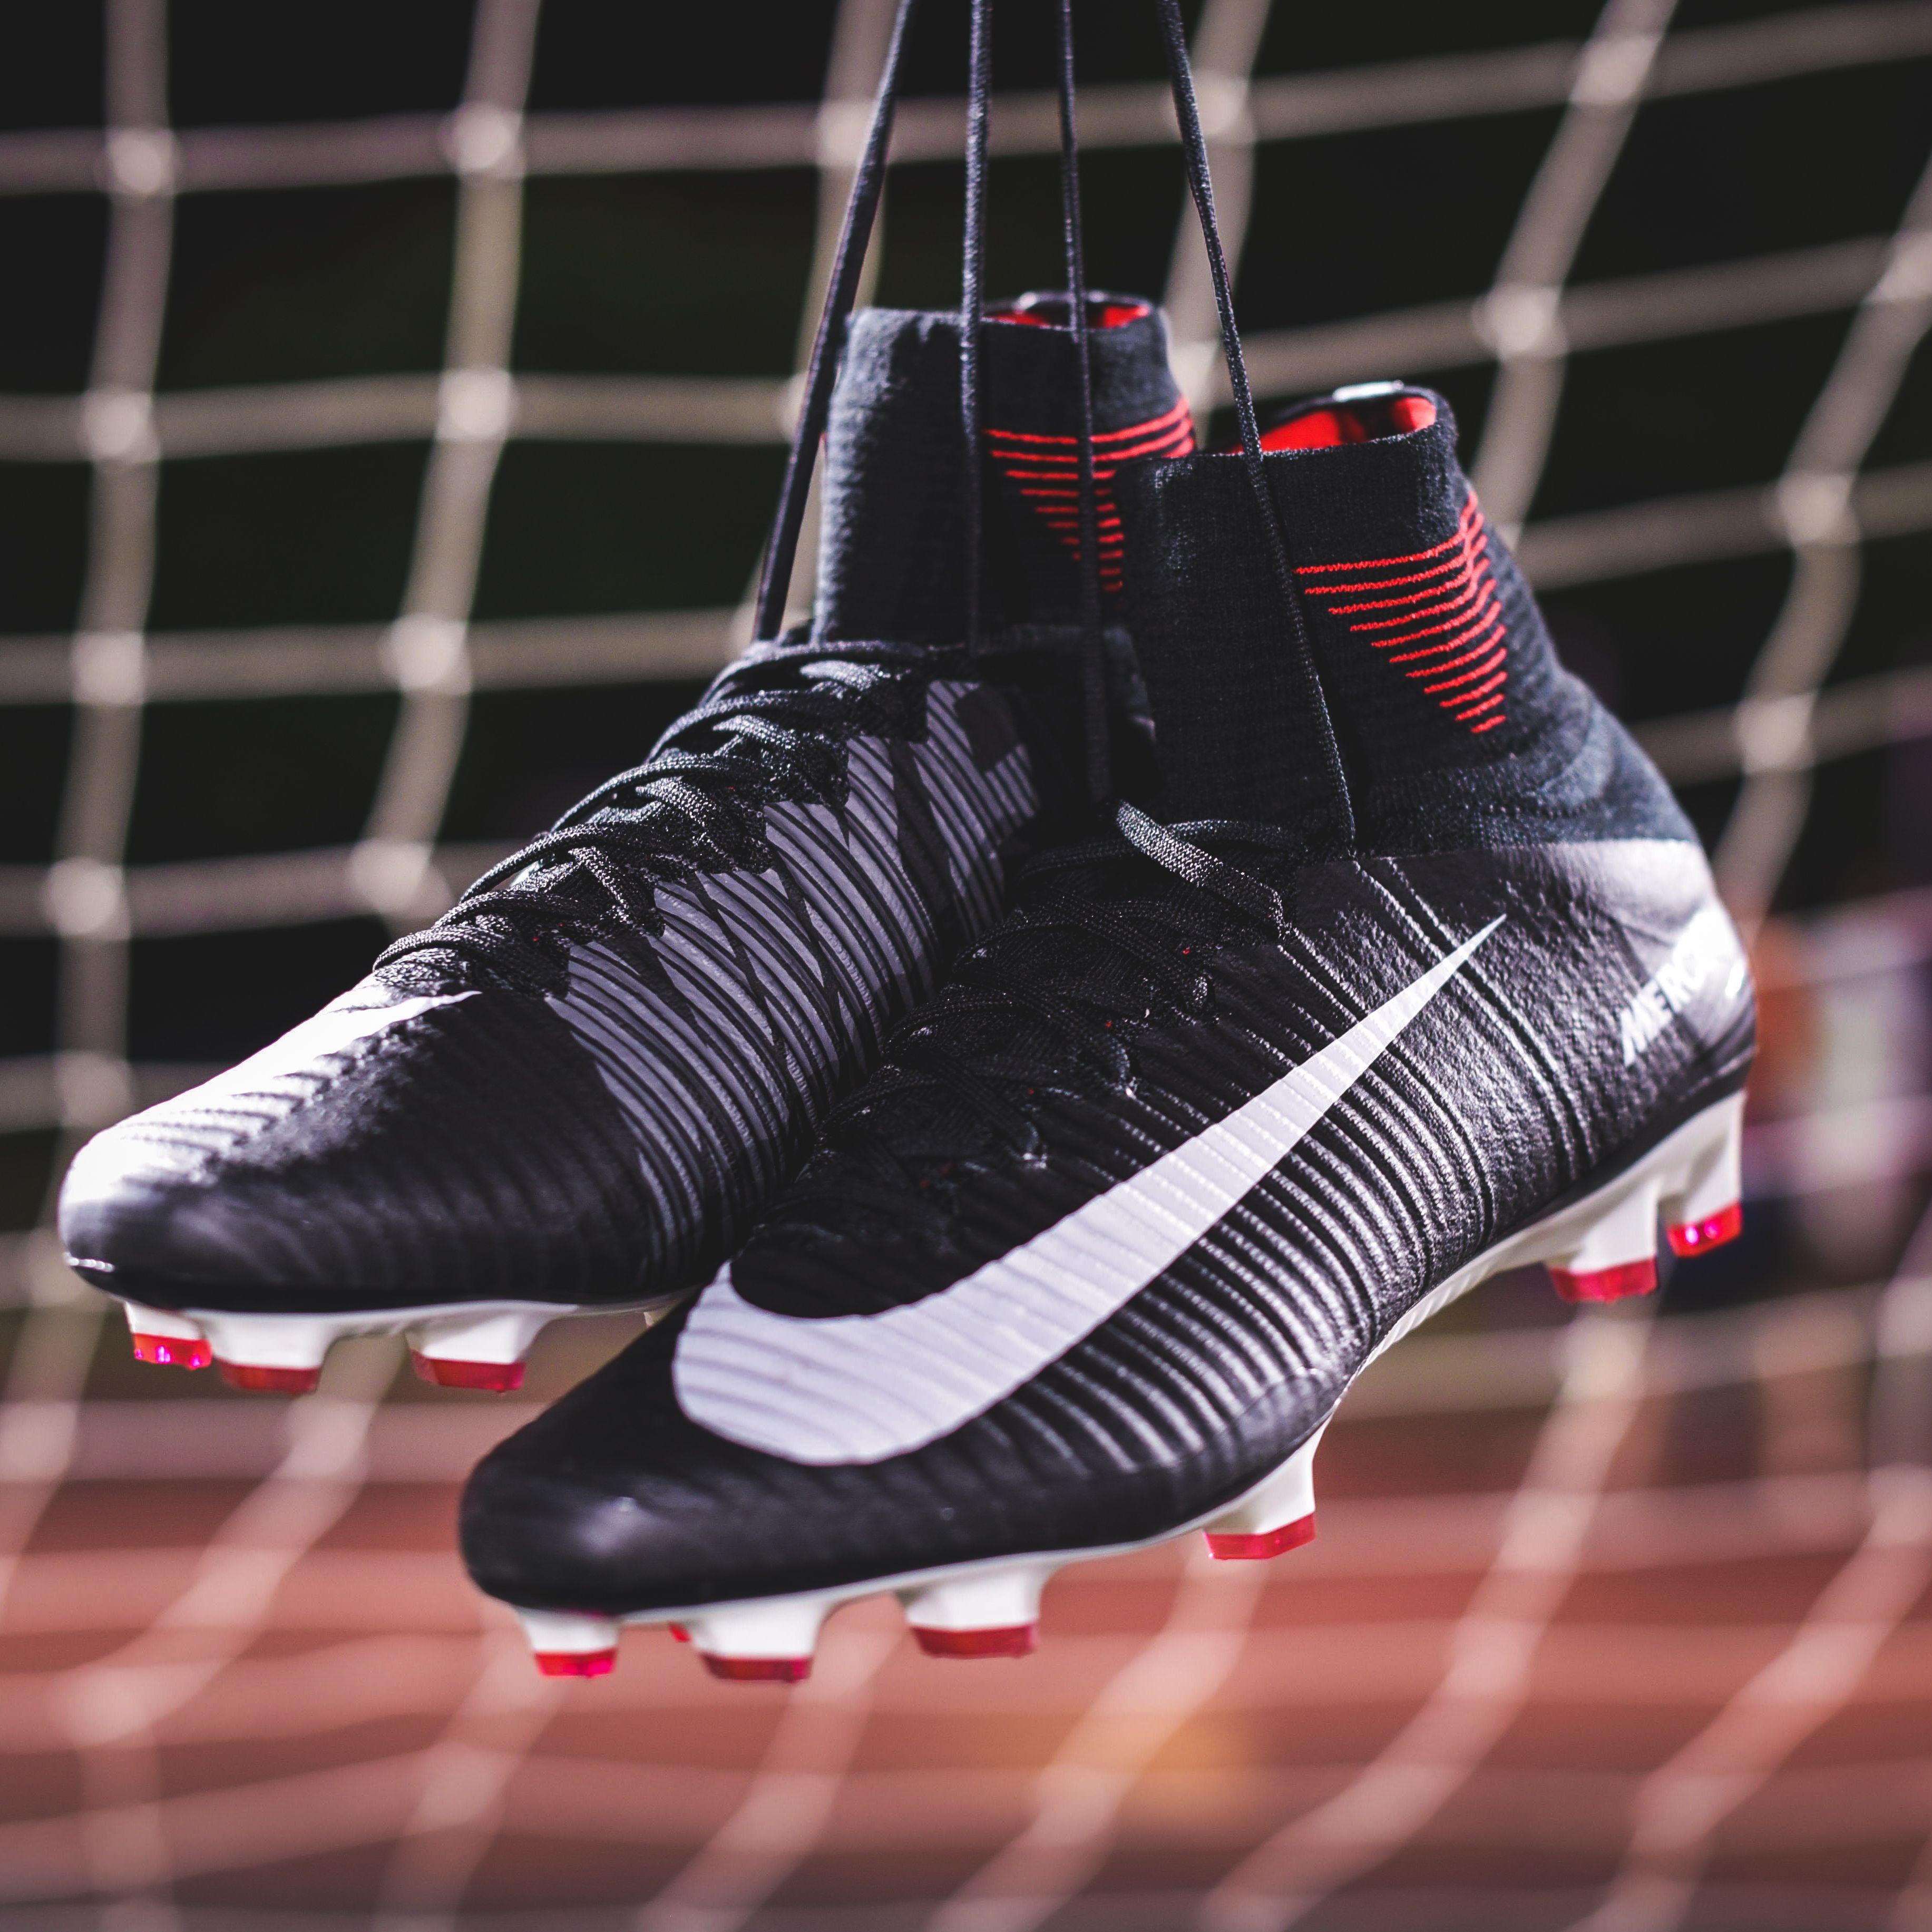 transfusión entrega pronto  Nike Mercurial Superfly Soccer Cleats   SoccerPro.com   Soccer boots,  Soccer shoes, Soccer cleats